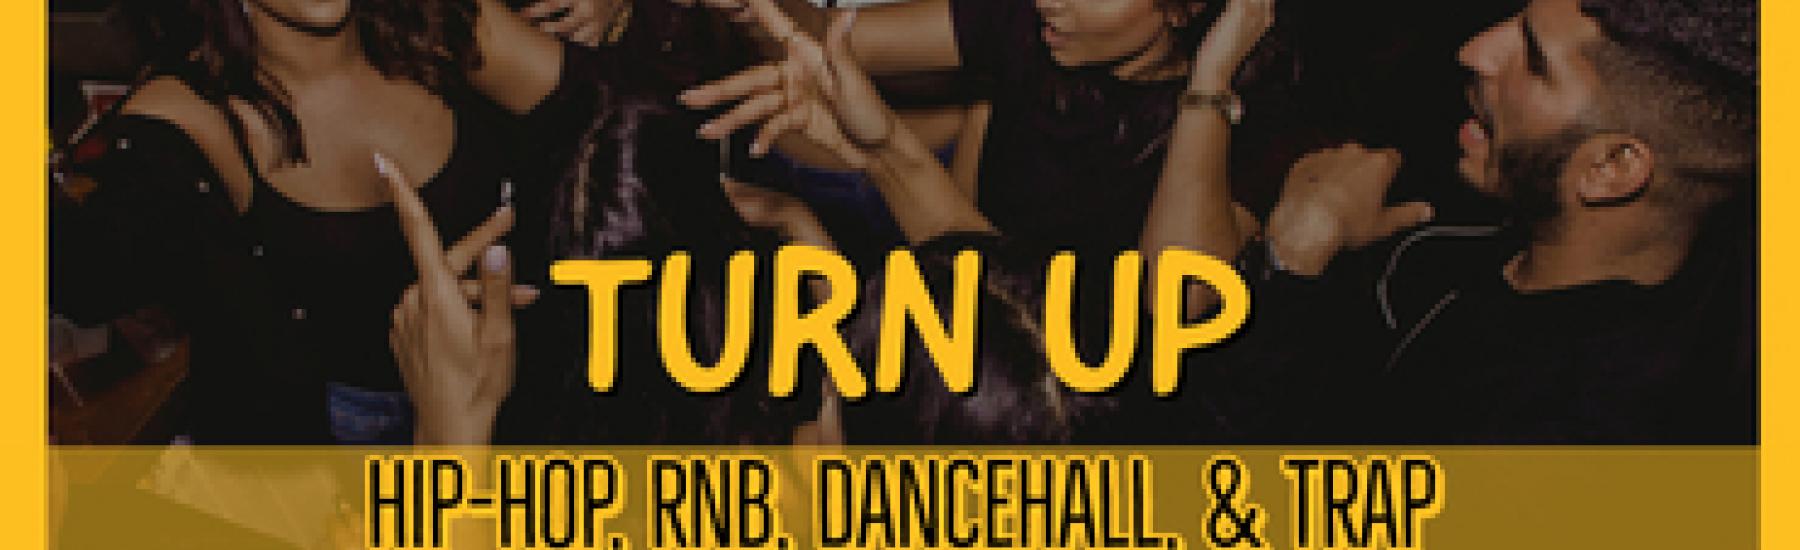 Turn Up South - Hip-Hop, RnB & Bashment